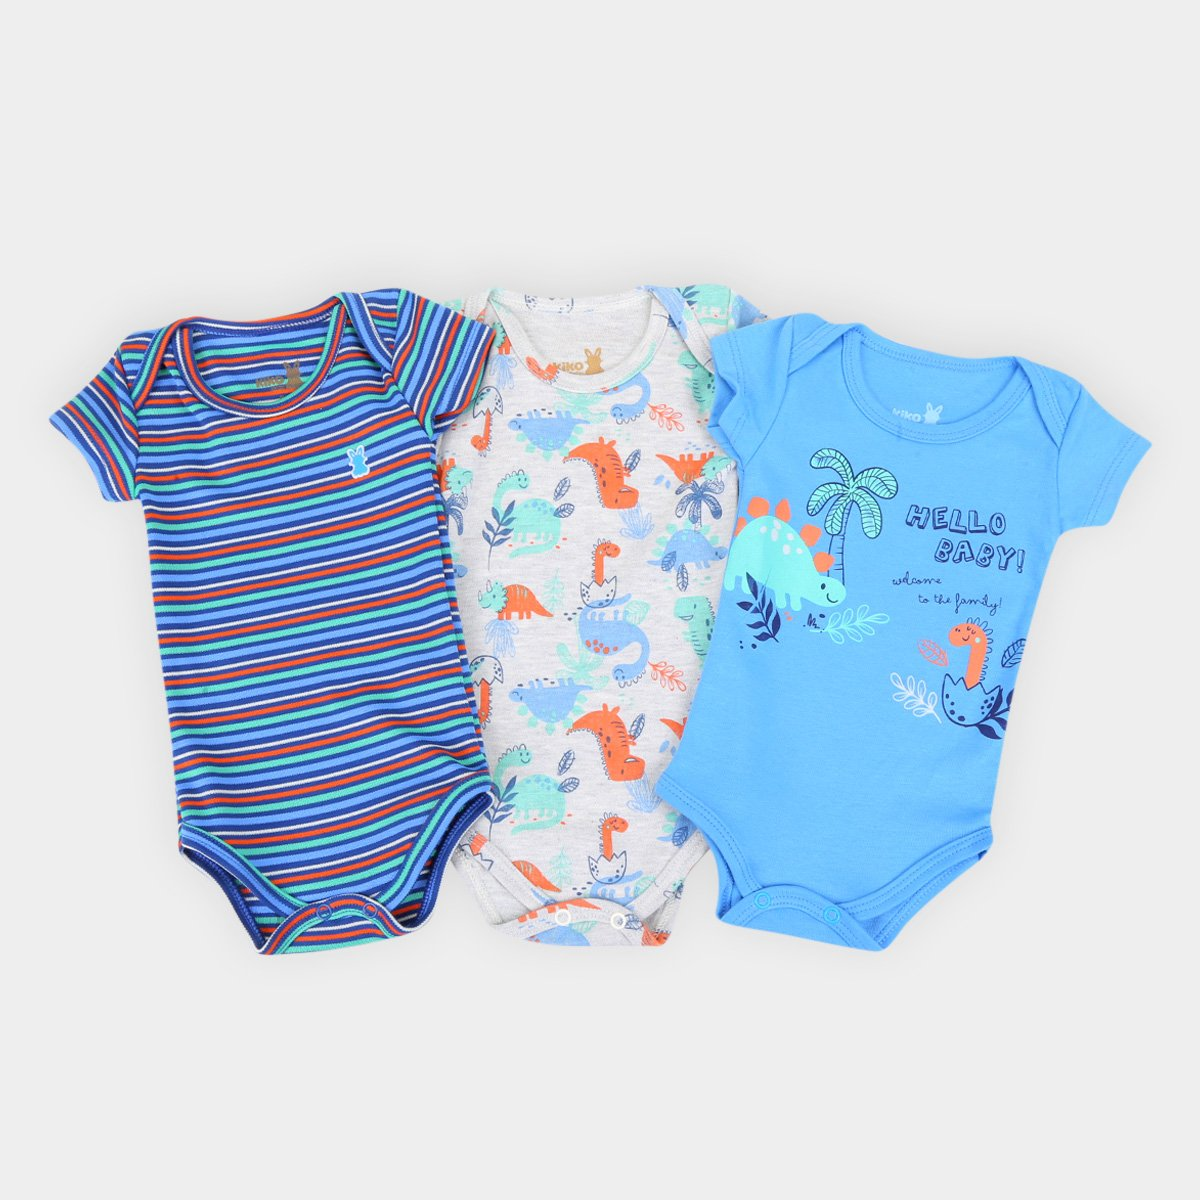 Kit Body Bebê Kiko & Kika Suedine Estampado Masculino 3 Peças